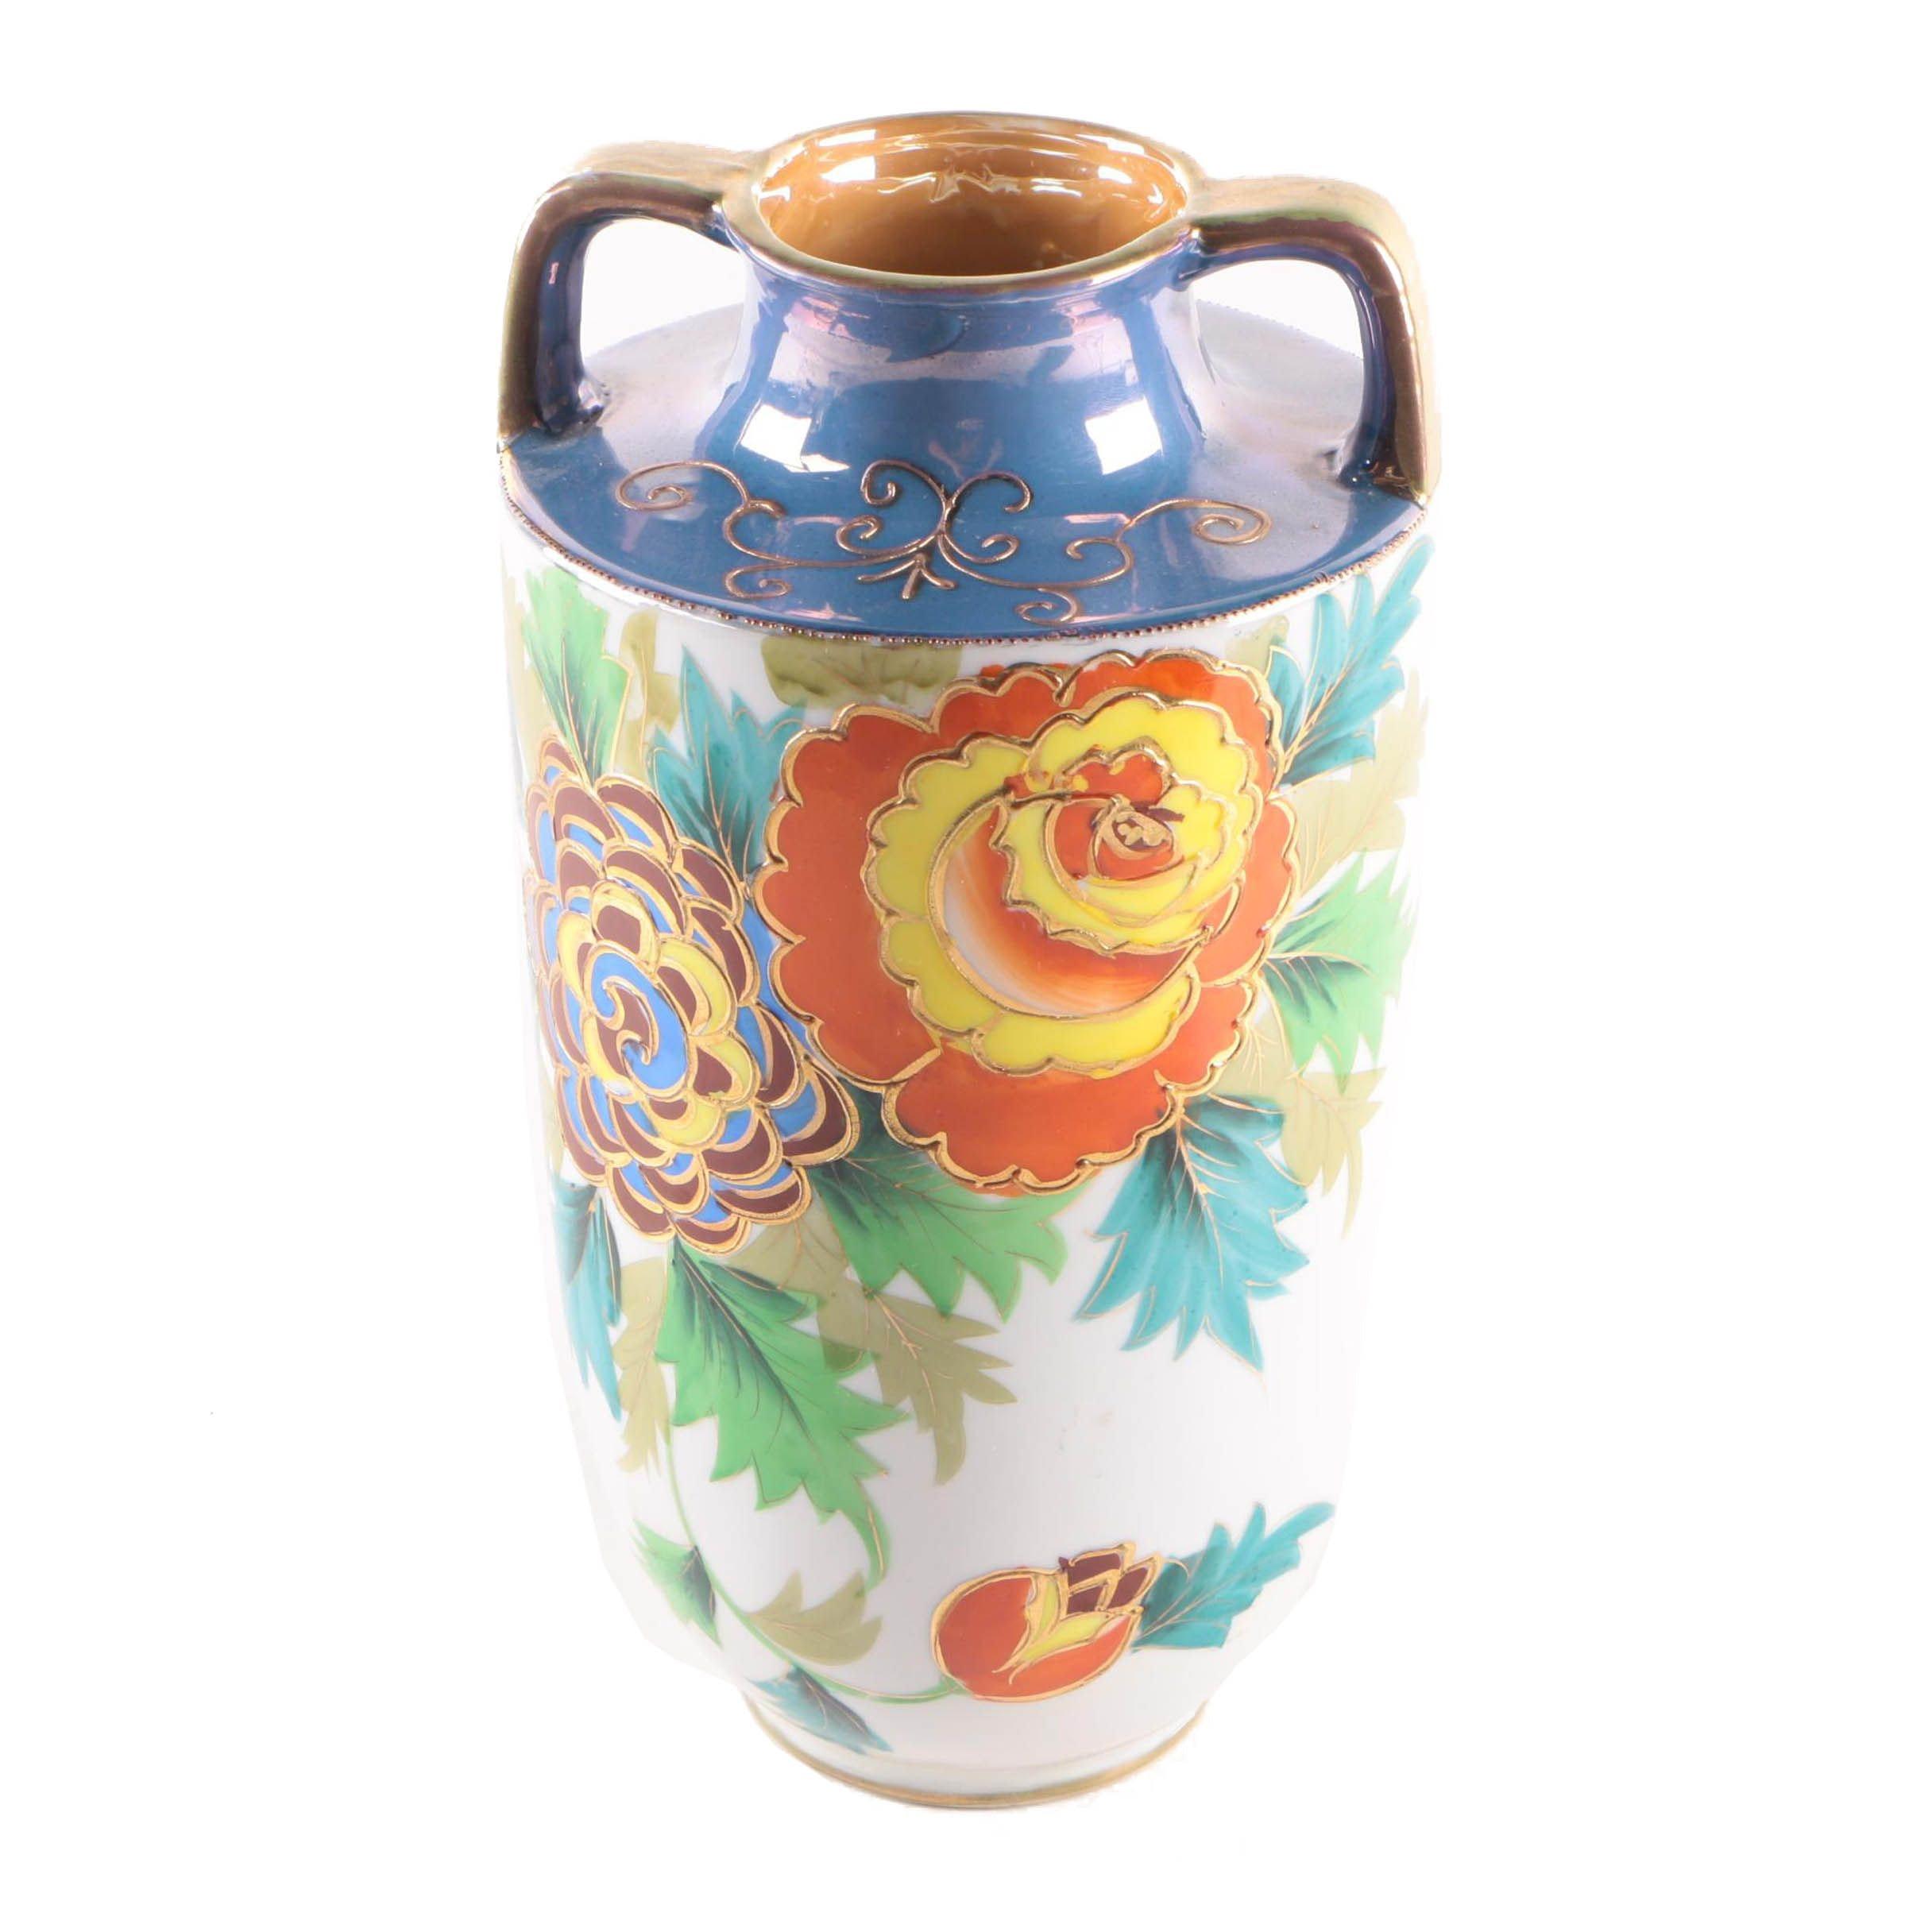 Vintage Japanese Hand-Painted Porcelain Vase